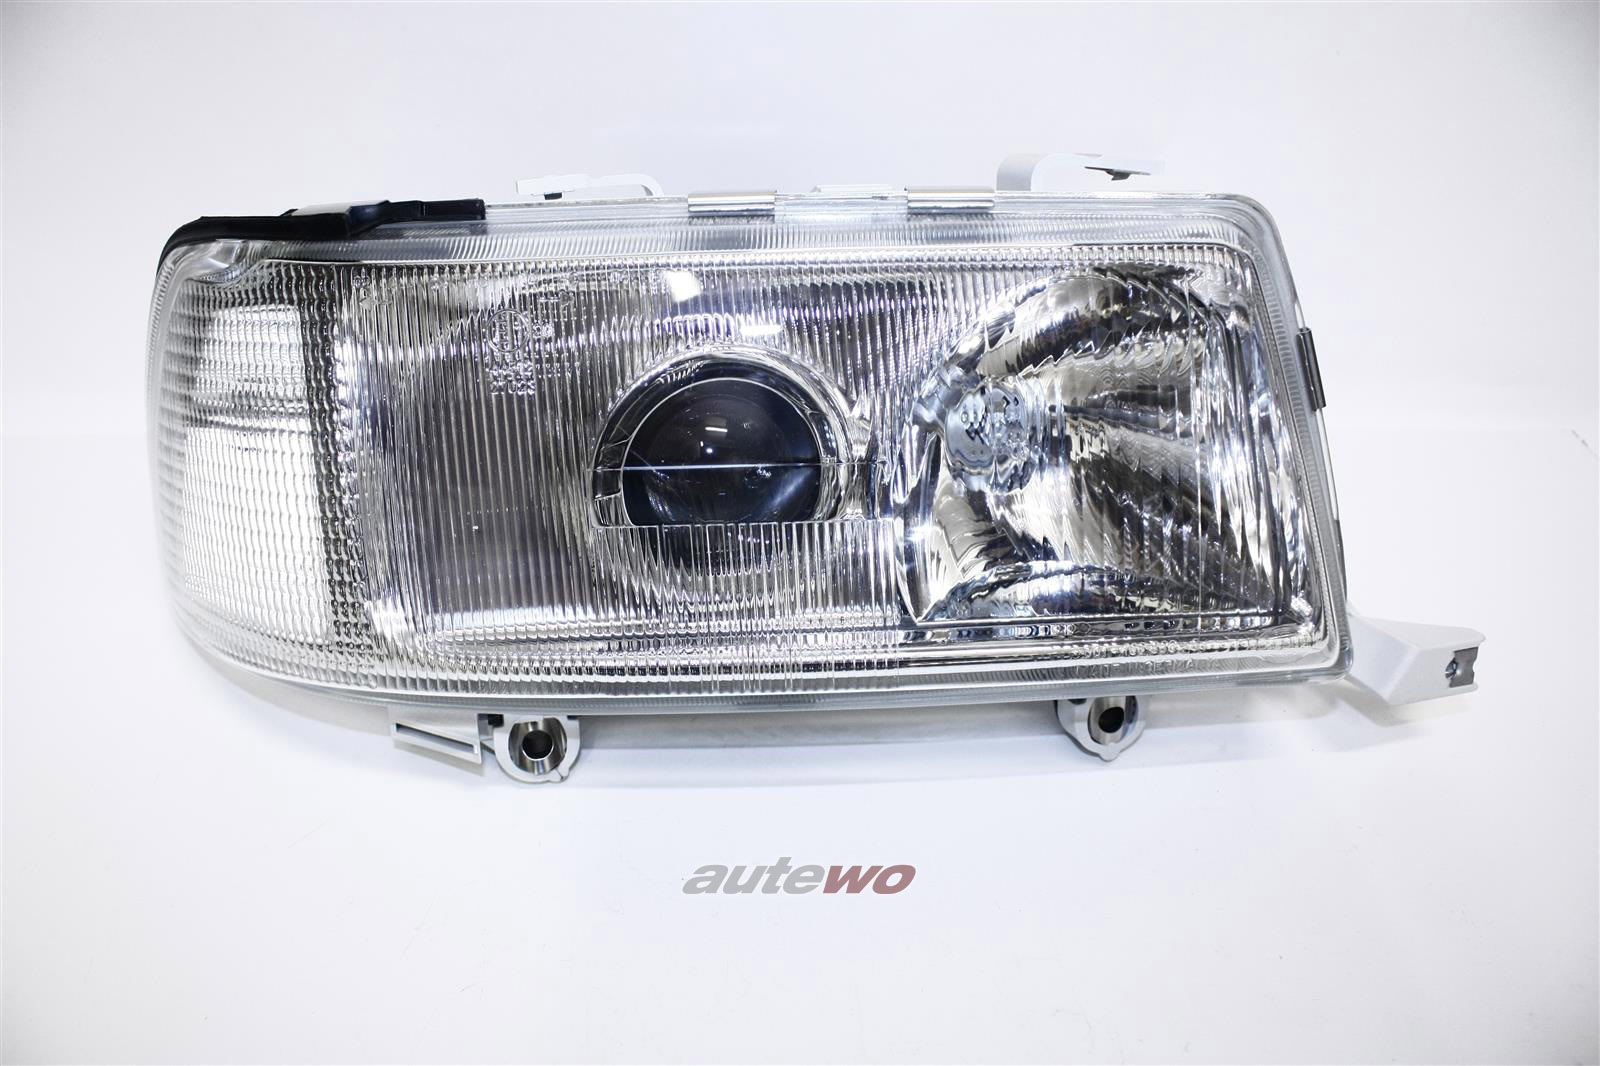 1AL007140-081 NEU Audi 80 B4/S2/RS2/Coupe/Cabrio DE-Scheinwerfer Rechts Hella